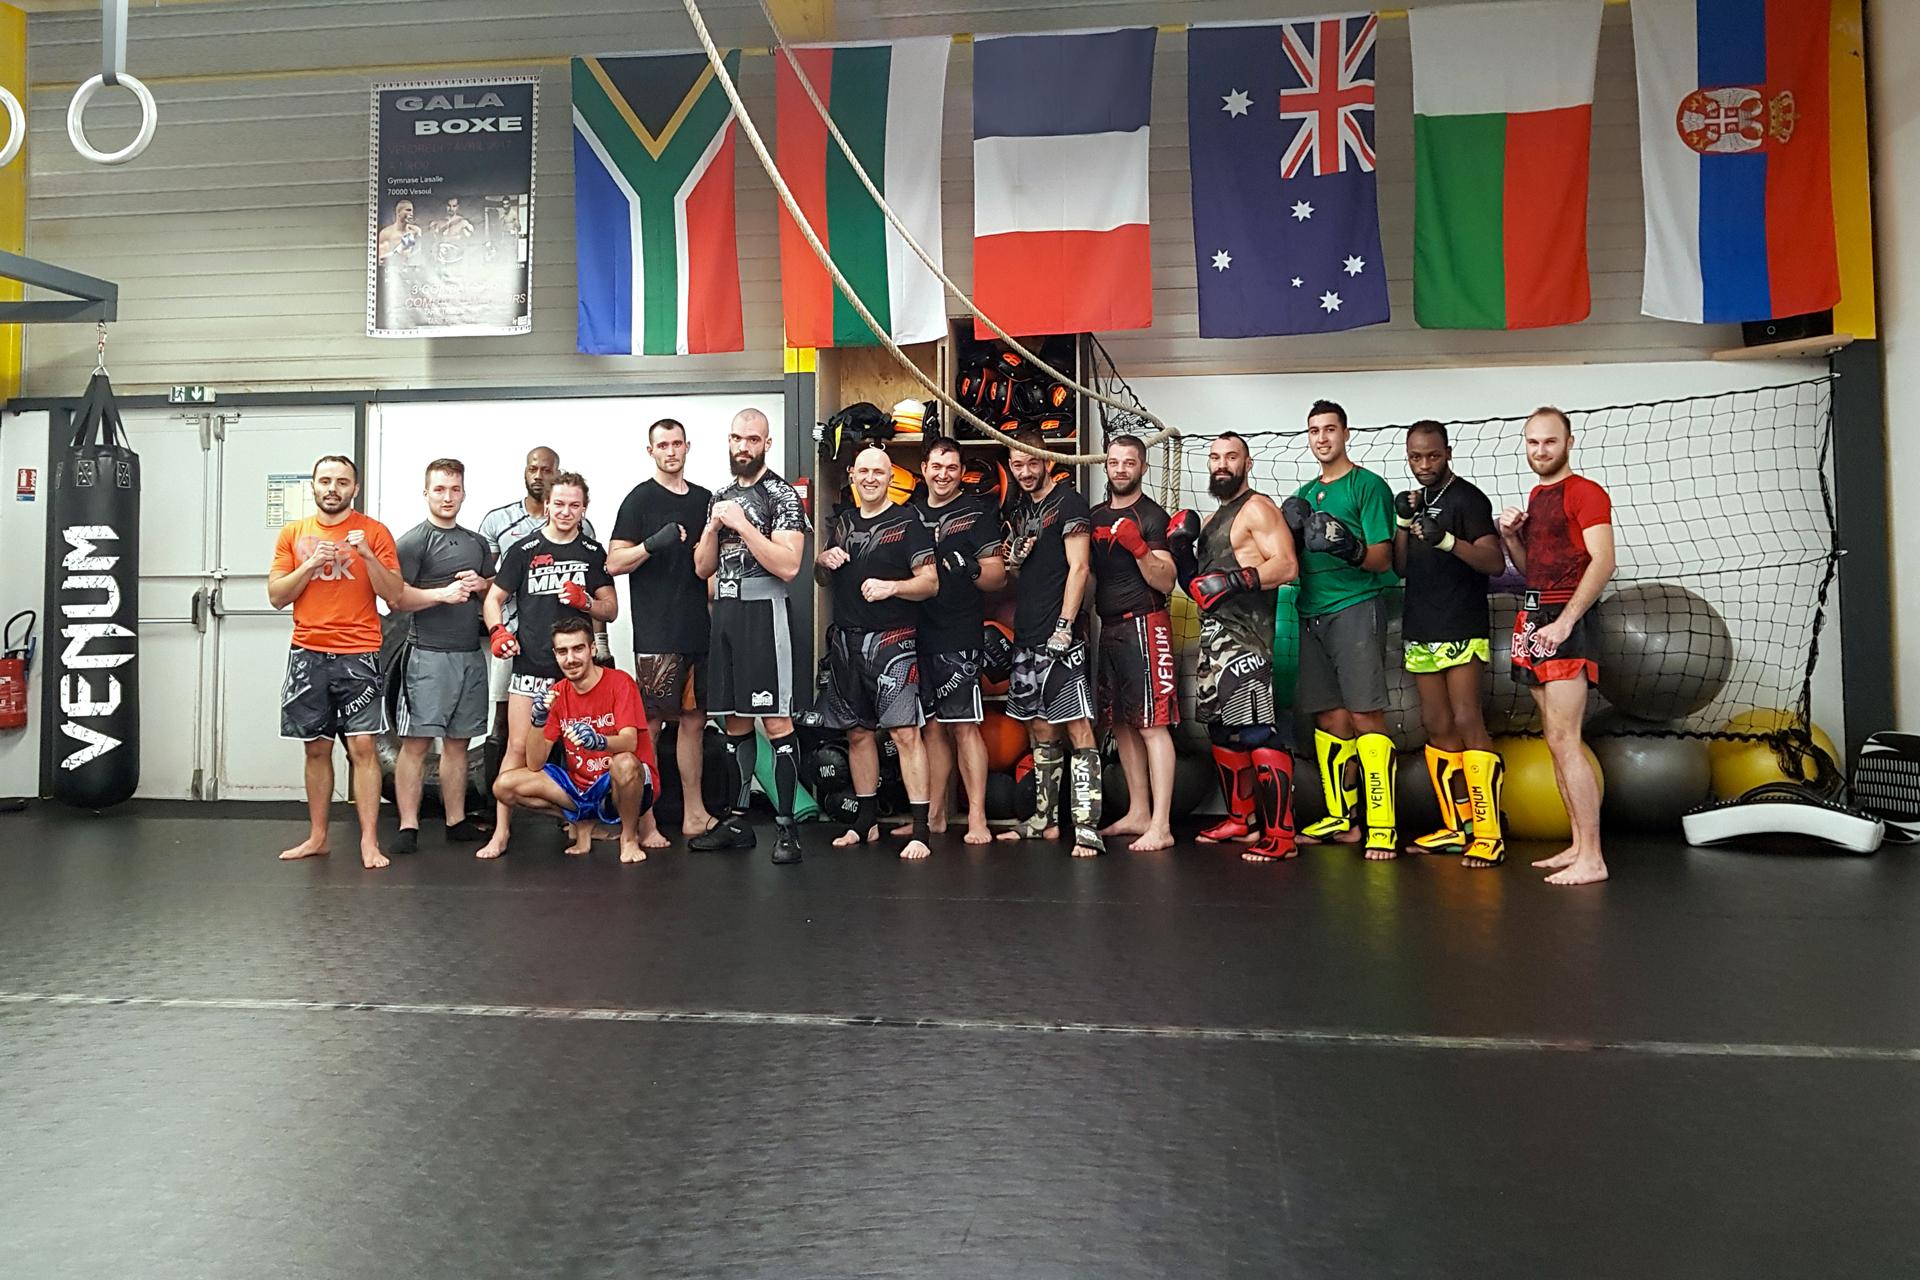 Boxe avec Team Radeff